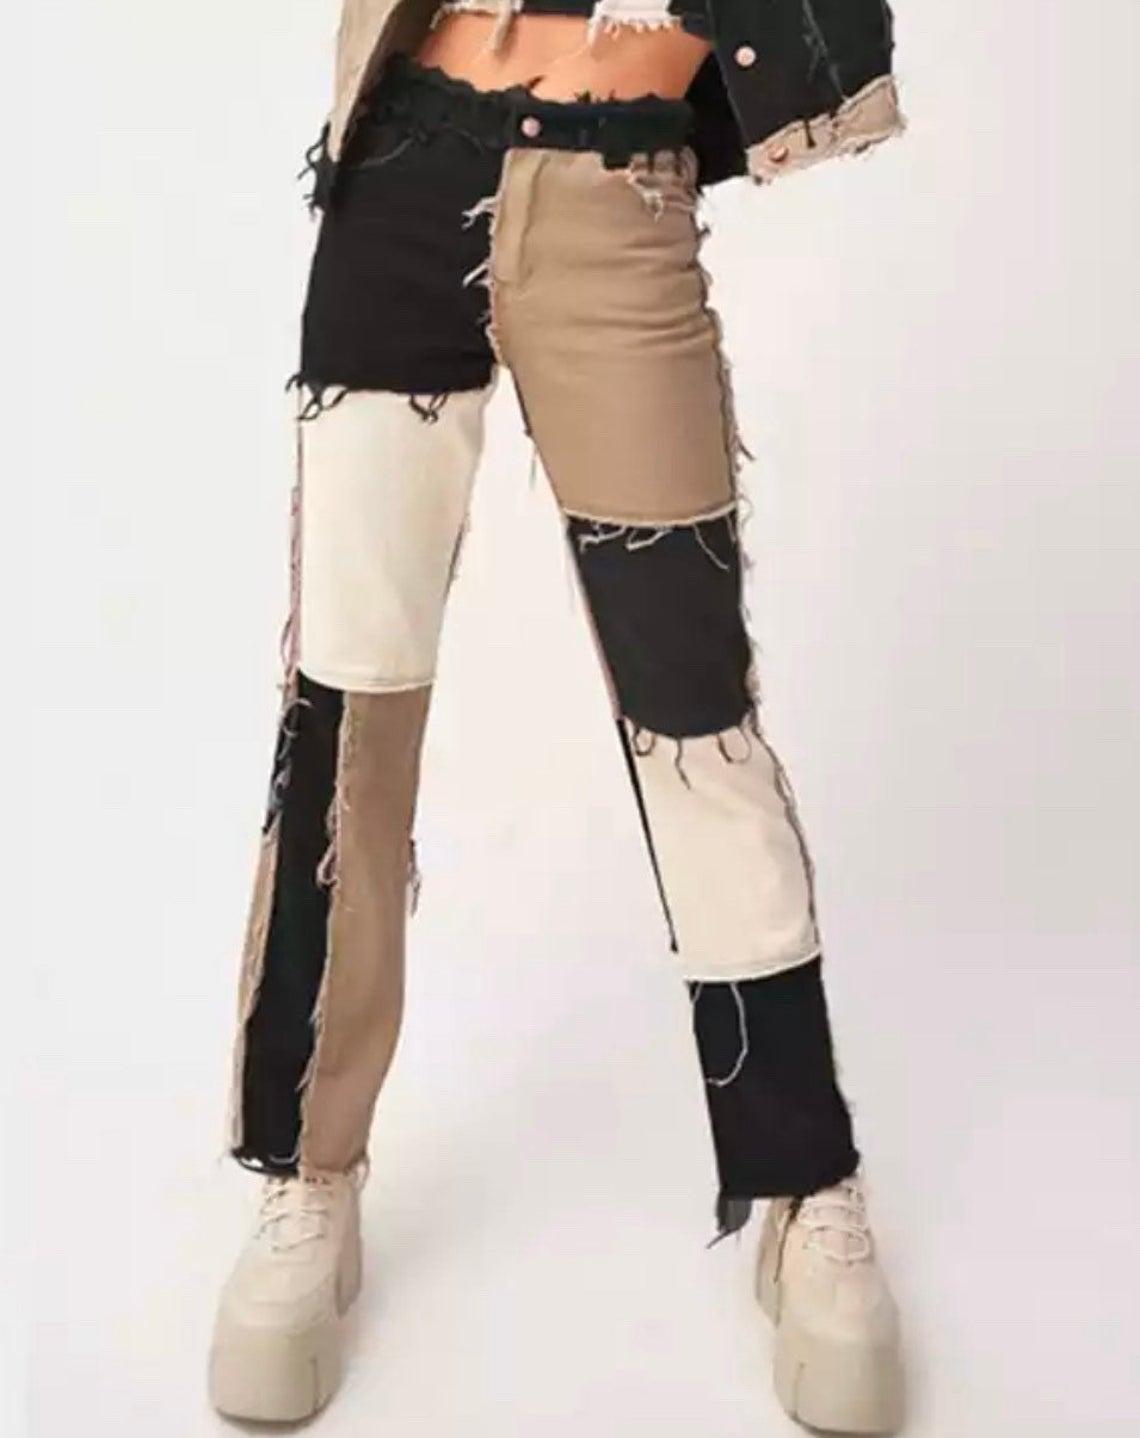 Colourful Patchwork Frayed Denim Jeans Colour Block High Waist Boot Cut